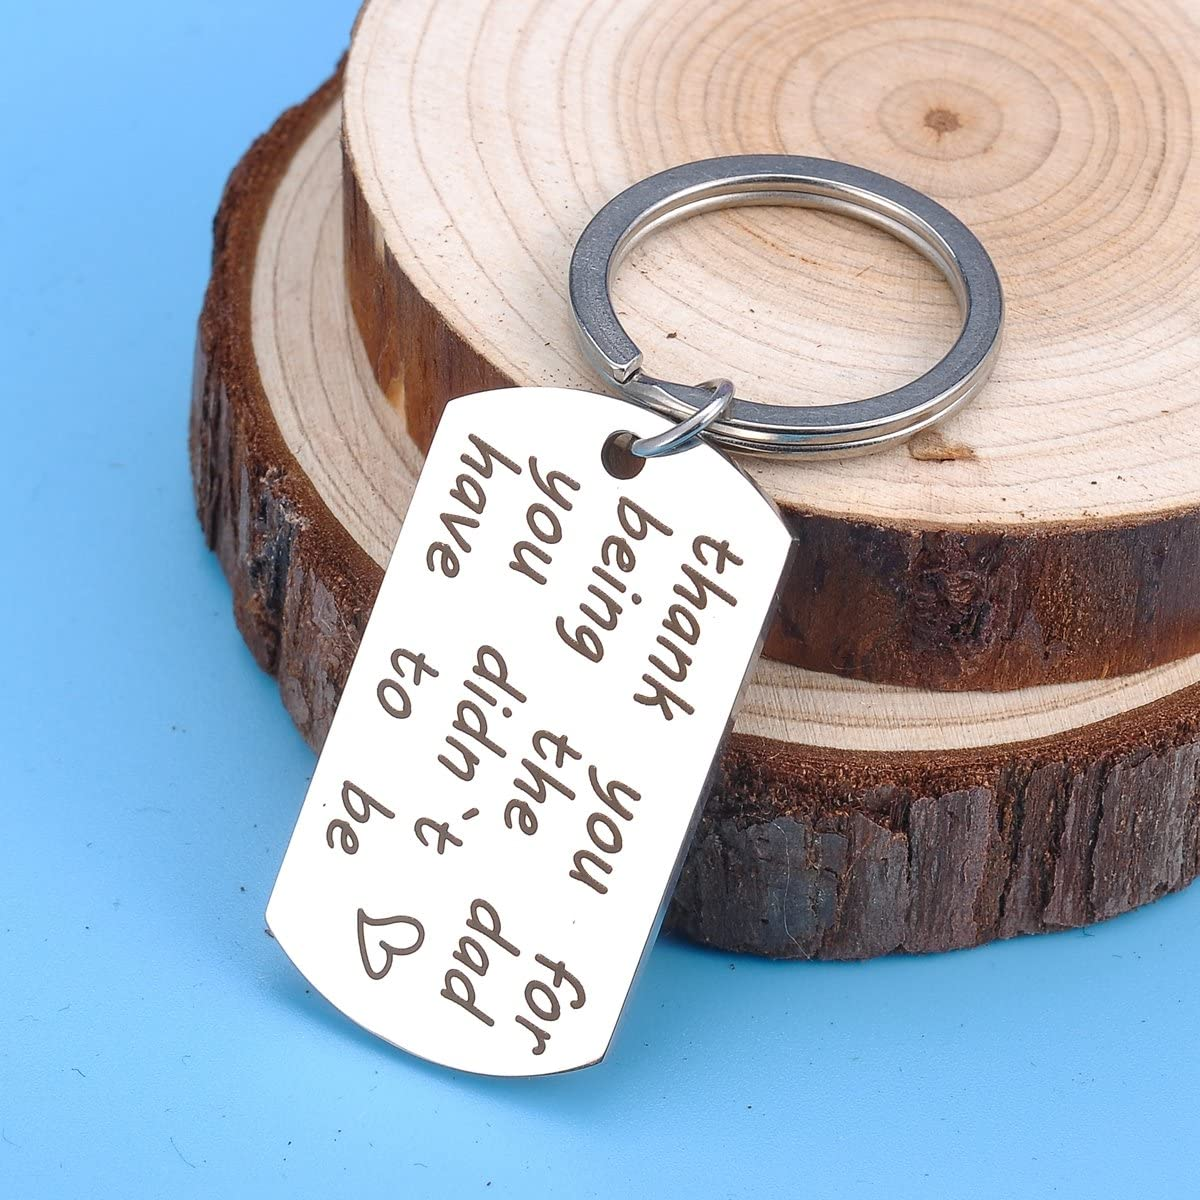 HOUSWEETY Charm Keychain Necklace Stainless Steel Plain Polished Finish